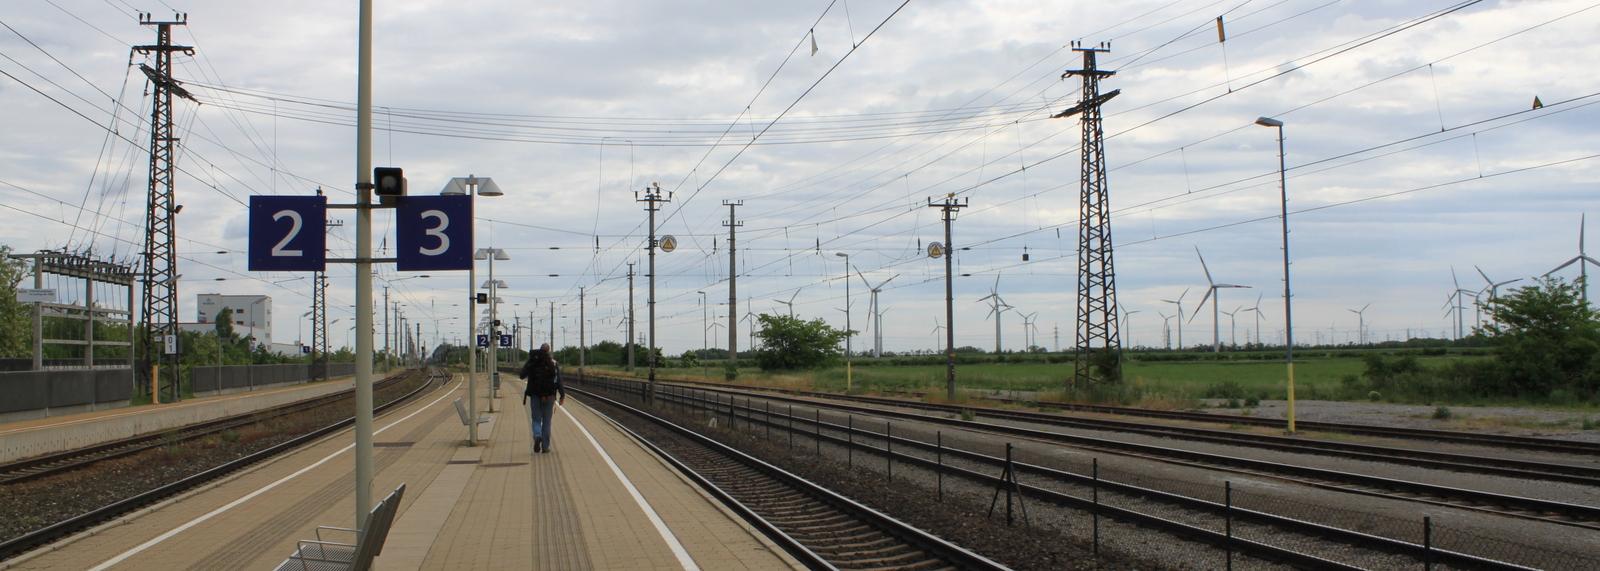 Station, Parndorf